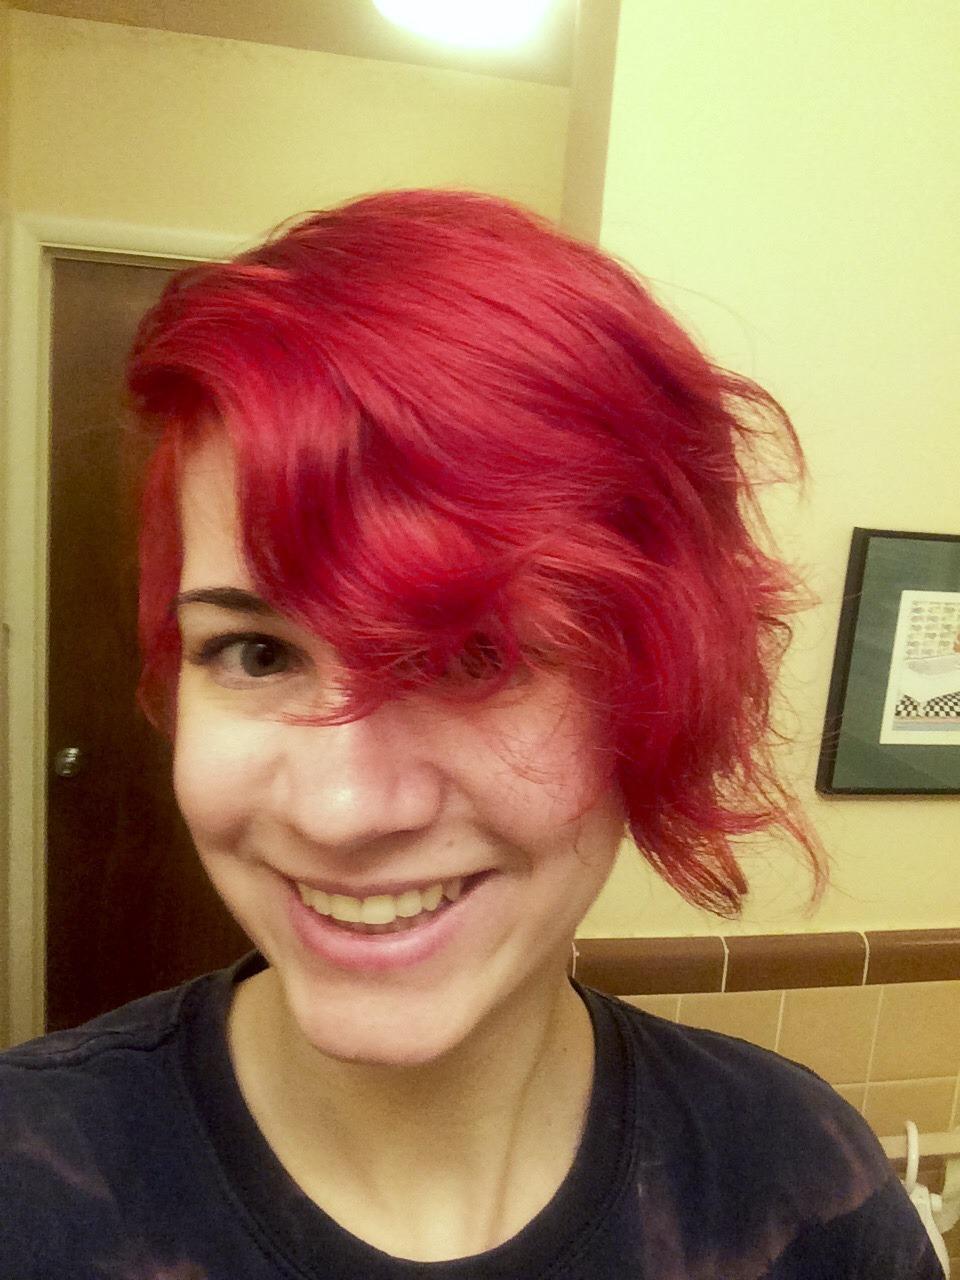 Samantha Doneff | Real-Time Fandub Wikia | FANDOM powered ...